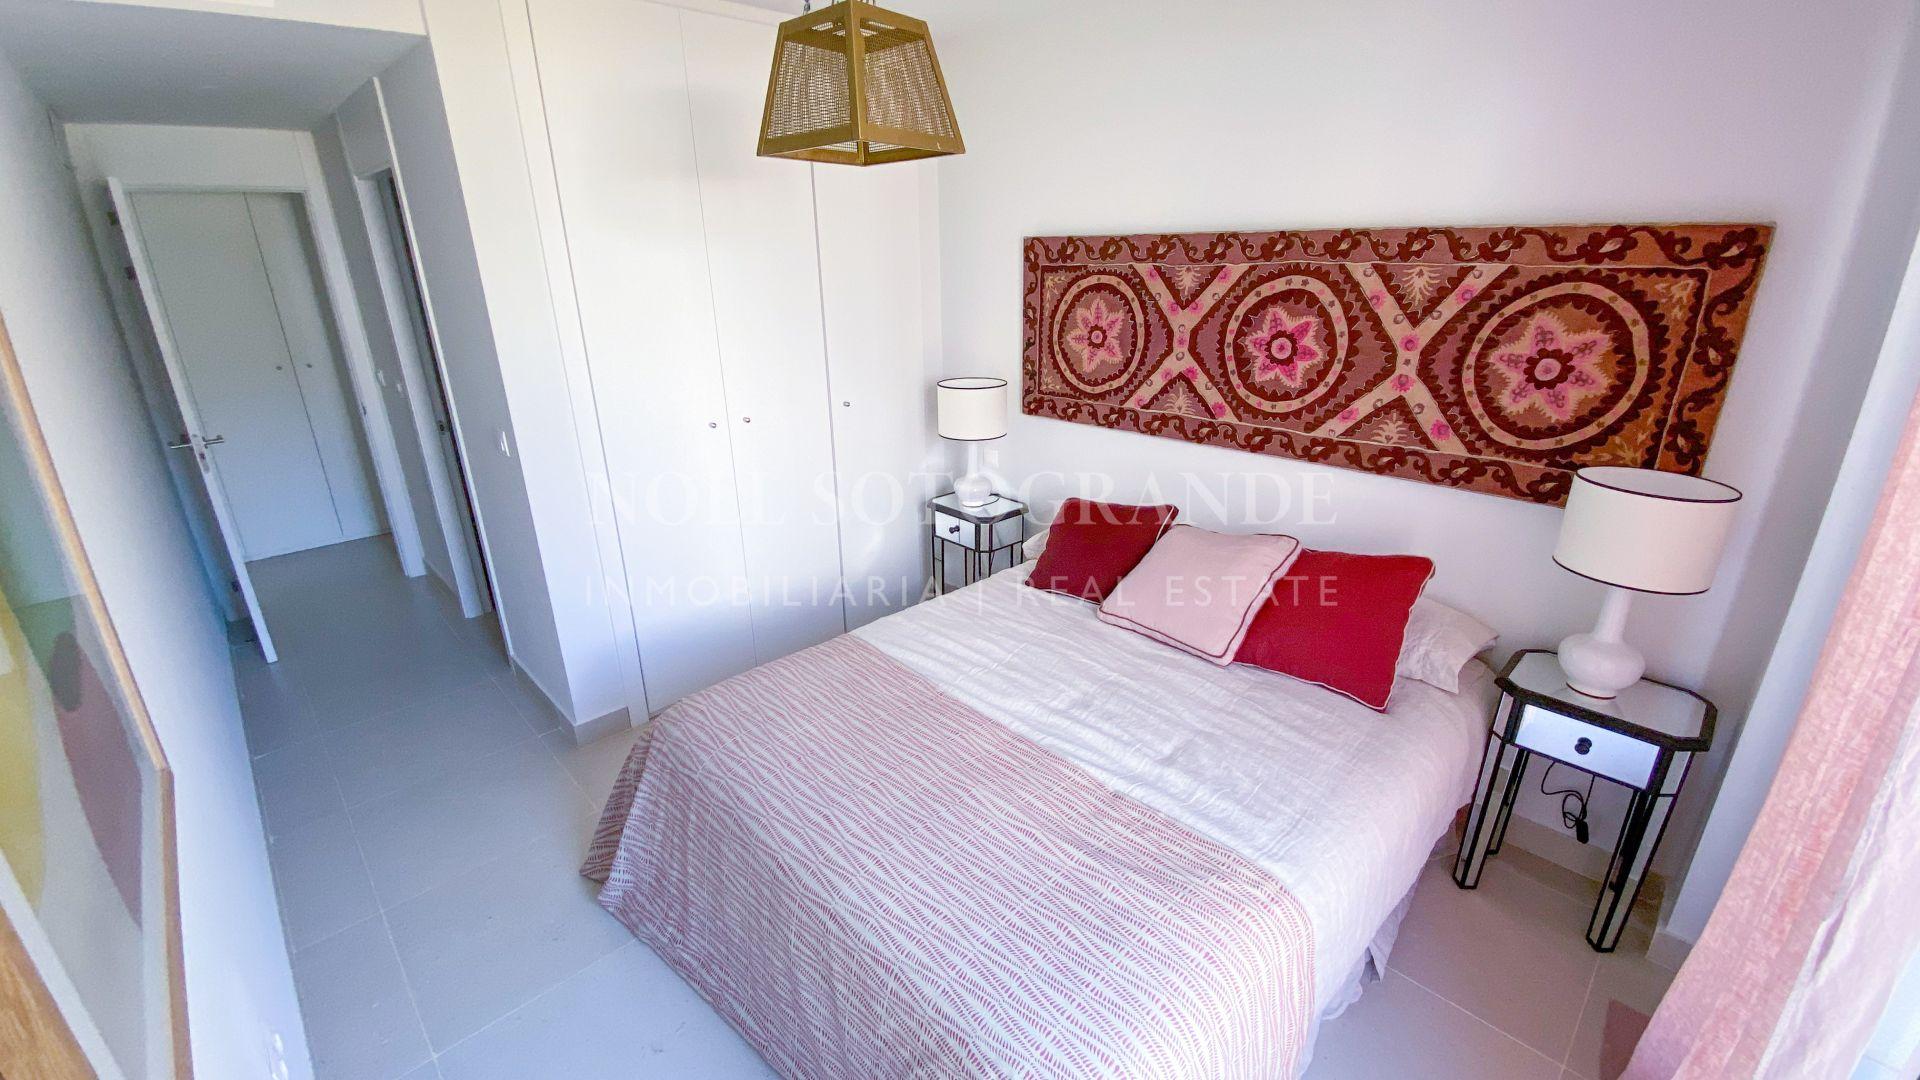 Senda Chica Sotogrande, Apartment Type Garden houses - Ground floor Apartments